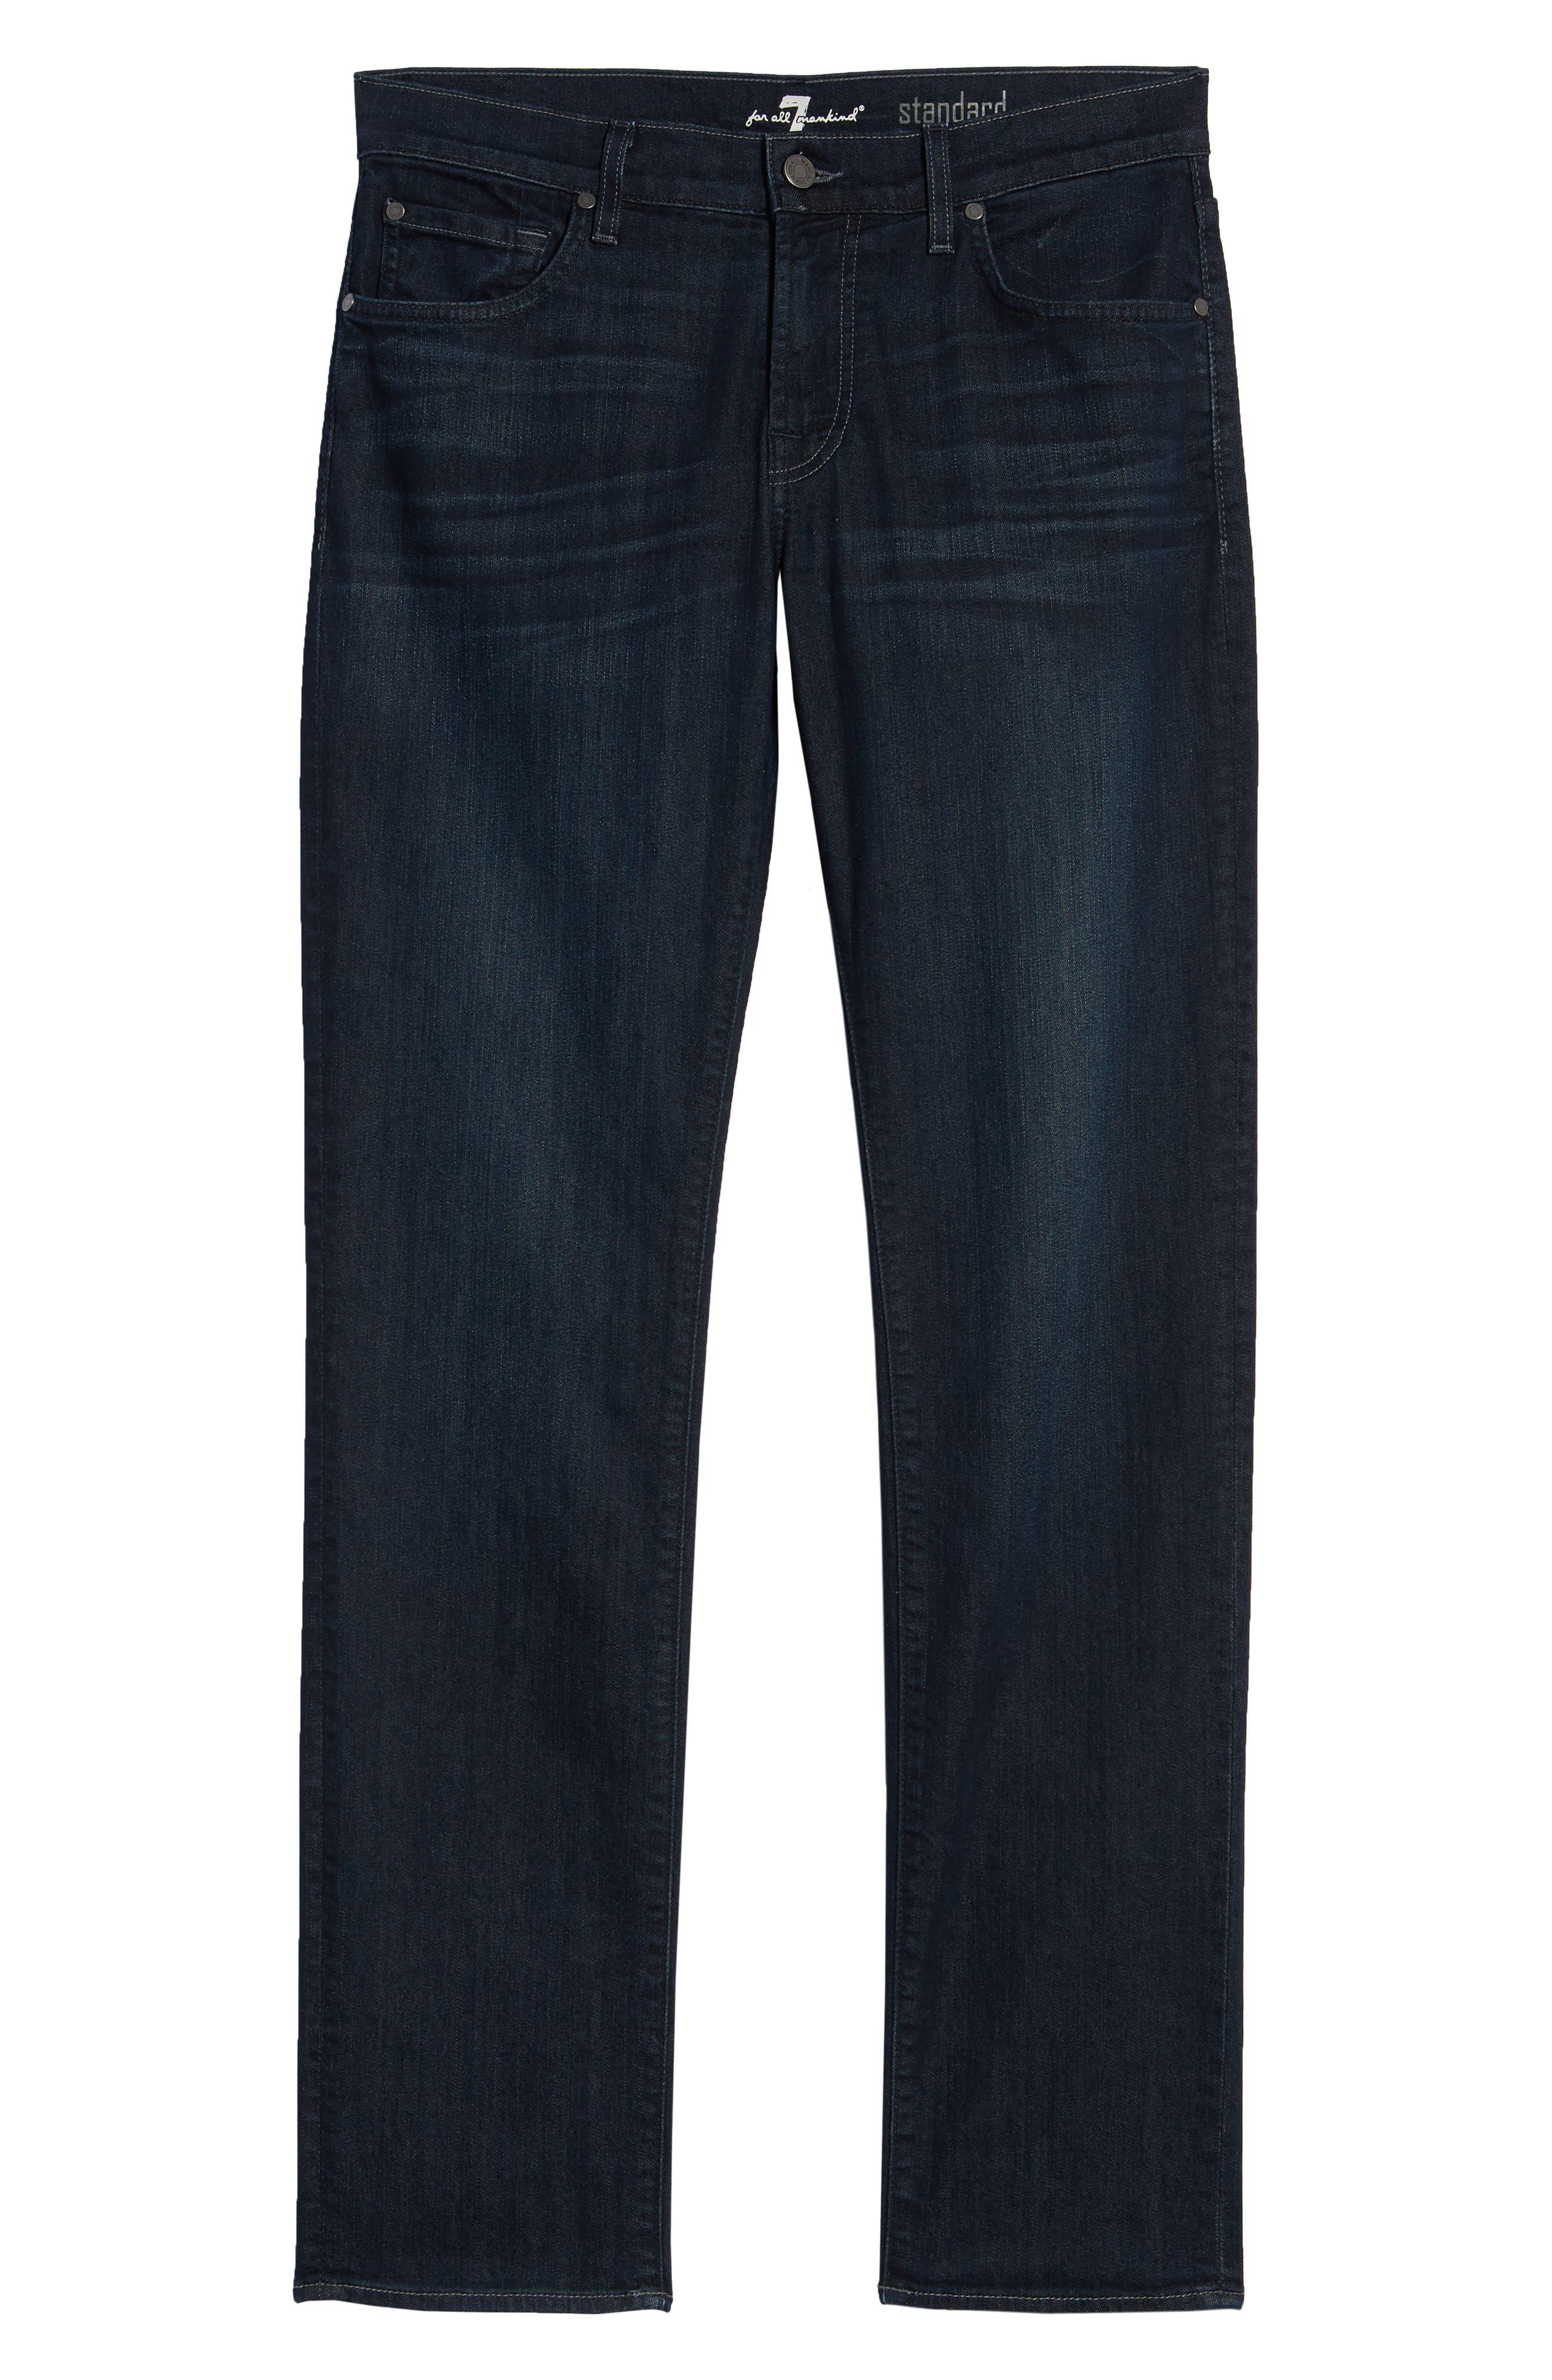 Airweft Standard Straight Leg Jeans,                             Alternate thumbnail 6, color,                             PERENNIAL